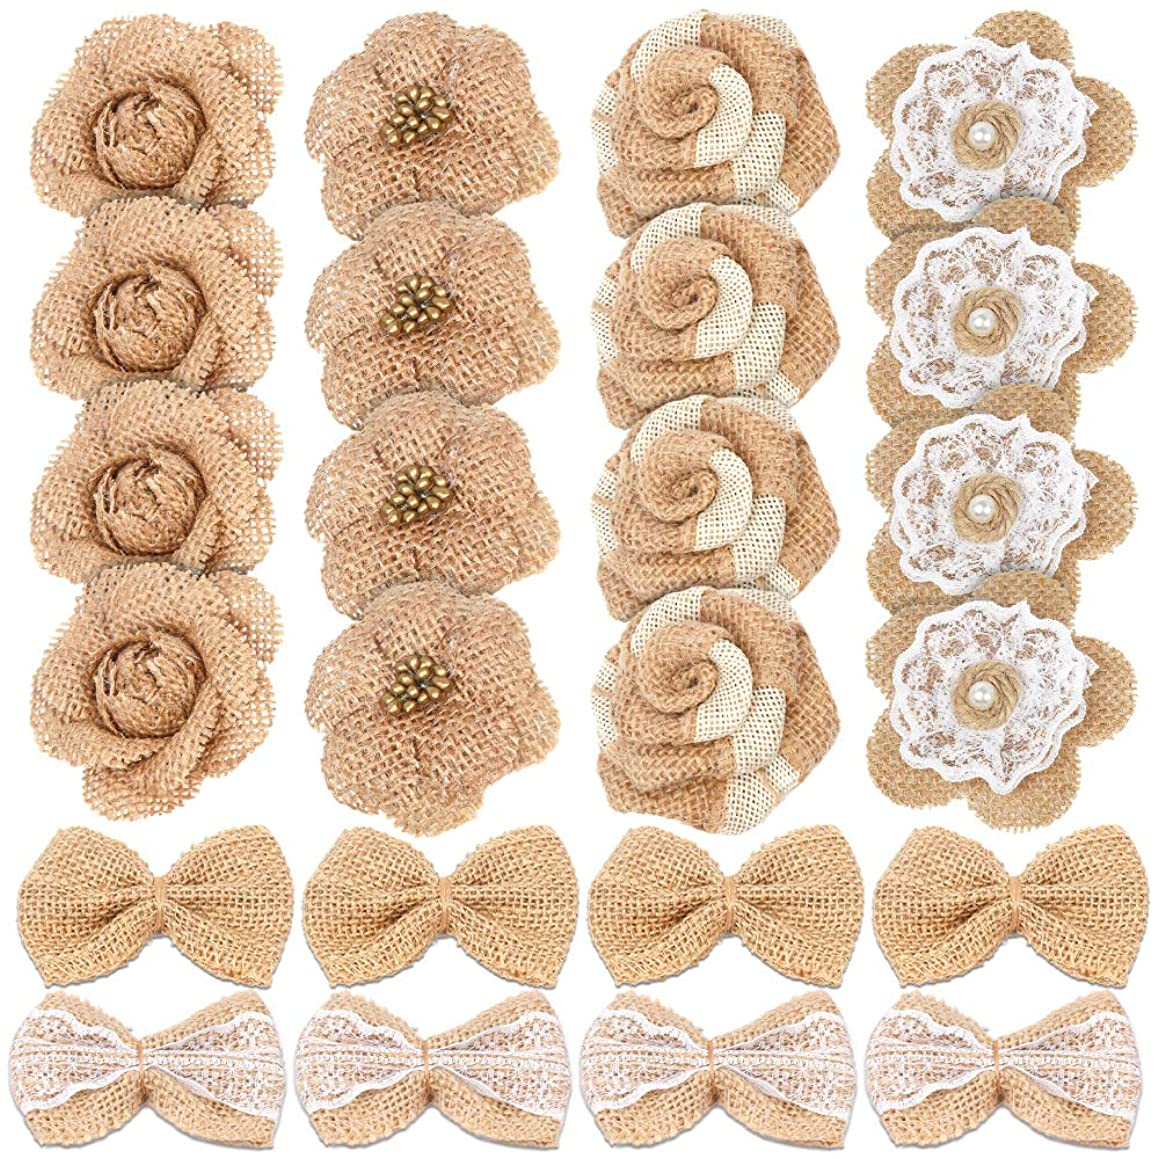 24PCS Handmade Natural Burlap Flowers, Include Burlap Rose Flowers, Burlap Lace Flowers with Pearls, Burlap Hibiscus Flowers, Burlap Bowknot, 6 Styles Vintage Burlap Rustic Flowers for DIY Craft